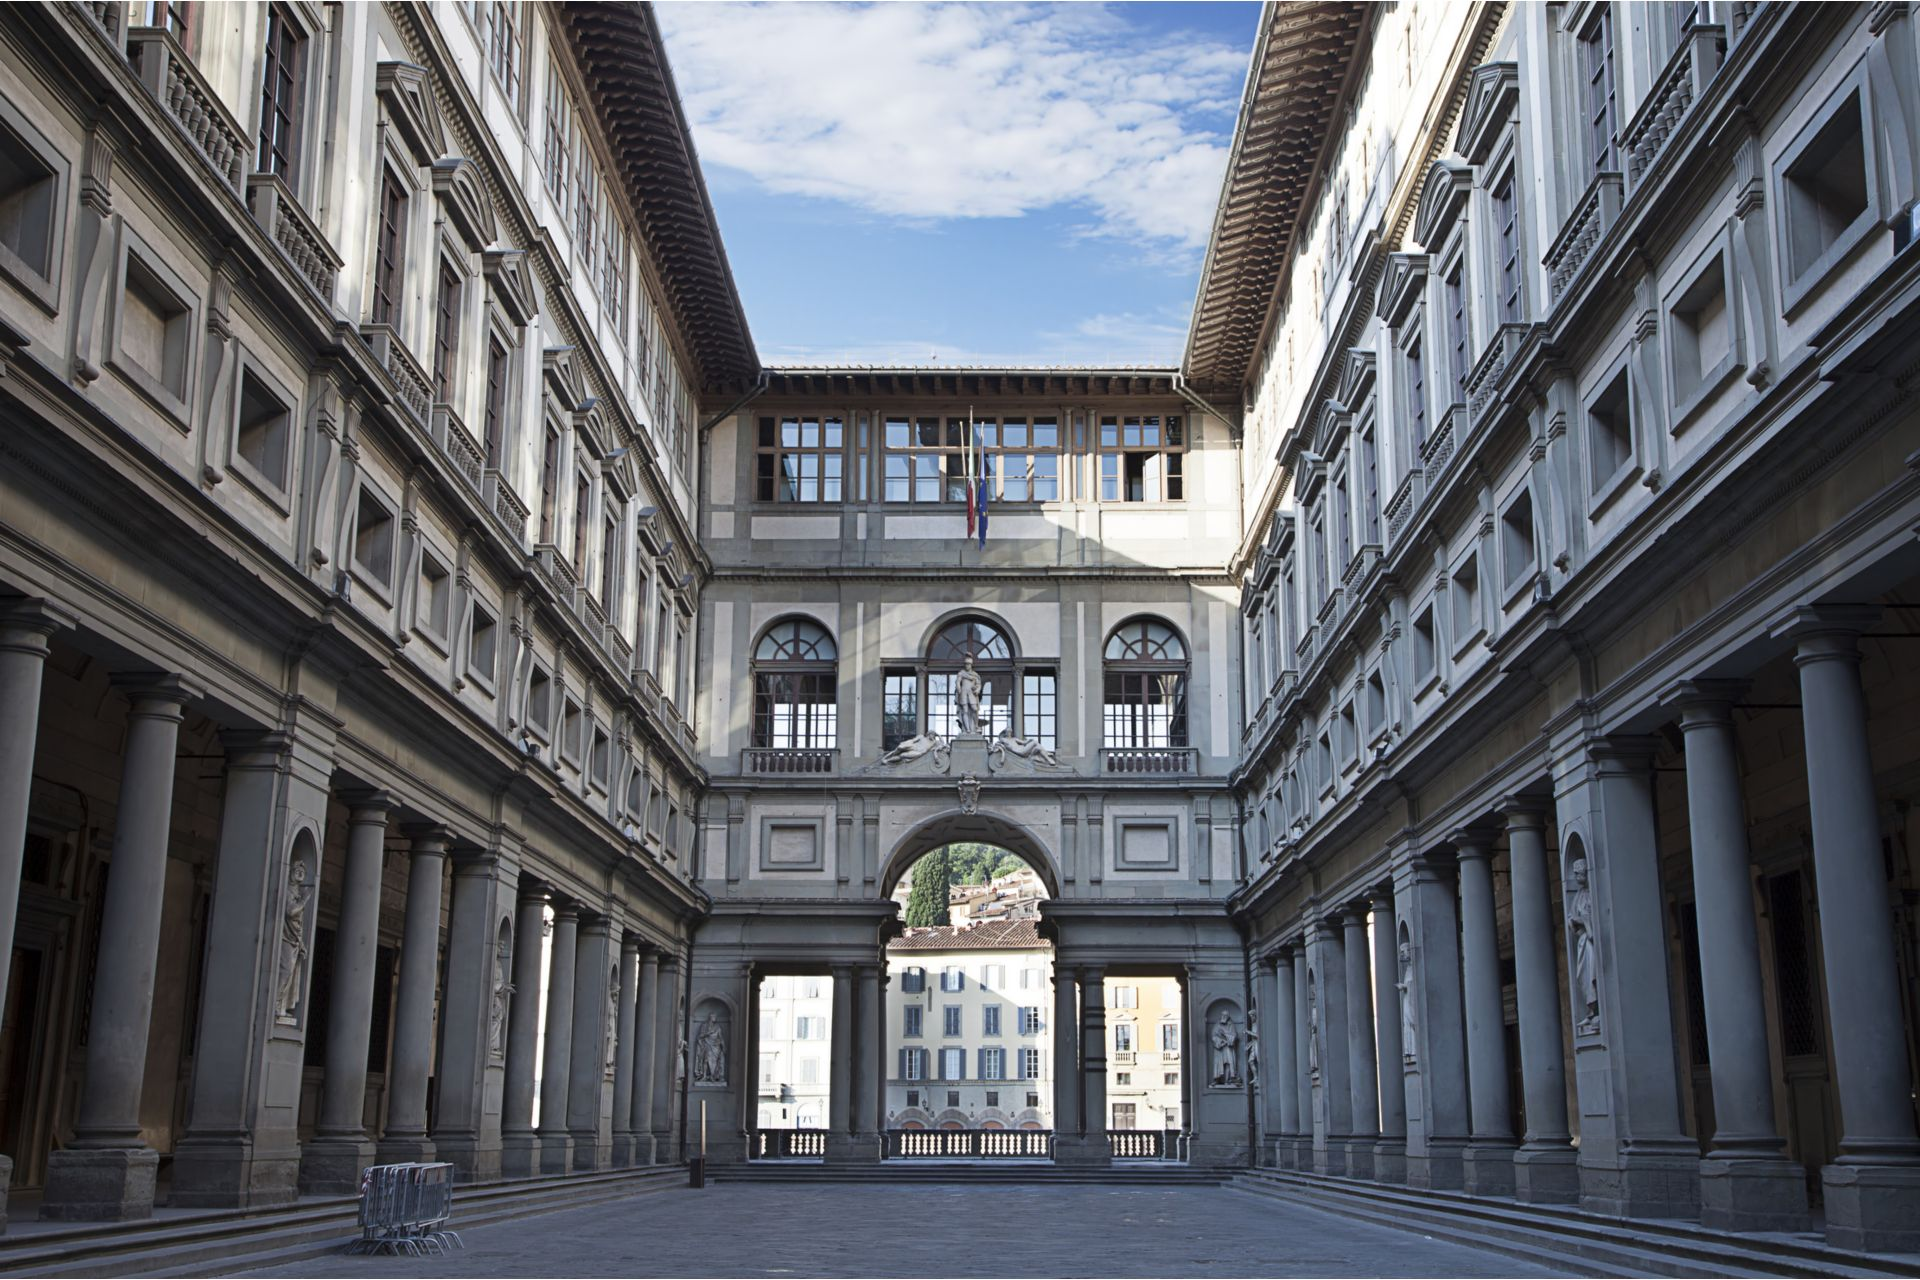 Uffizi Gallery, primary art museum of Florence. Tuscany, Italy